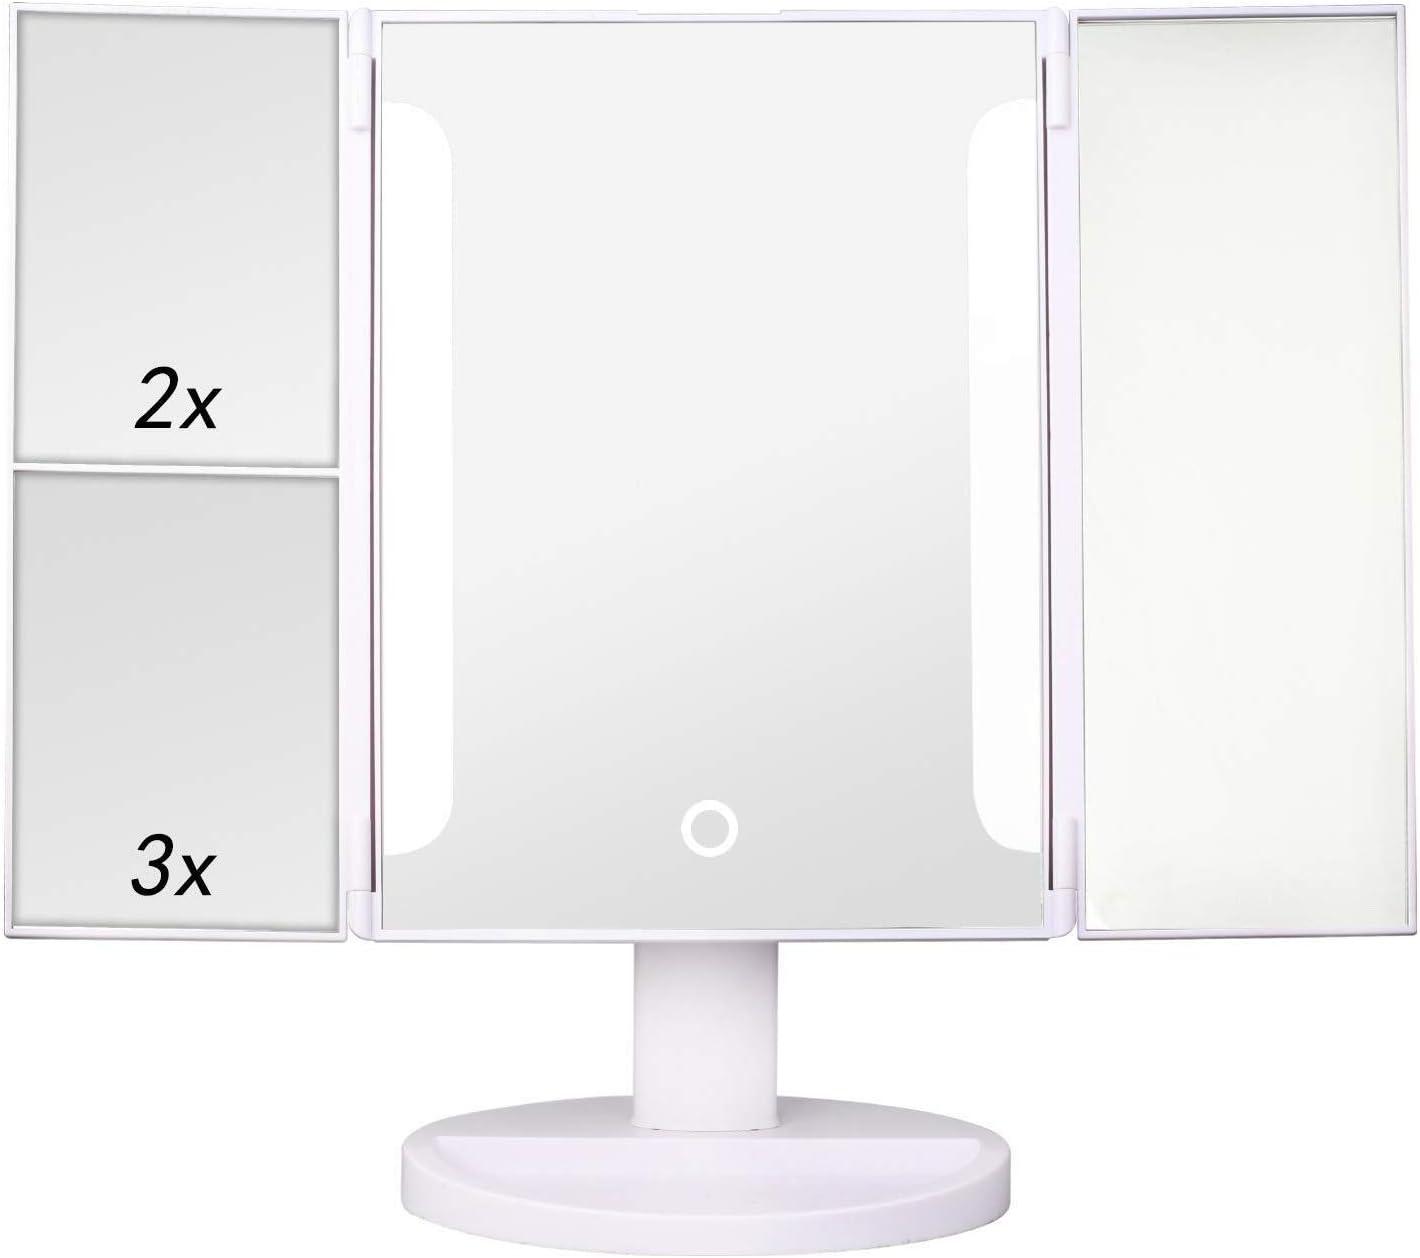 KXA LED Tri-Fold Makeup Mirror 1X Led 2 Sale Import SALE% OFF Vanity Lighted